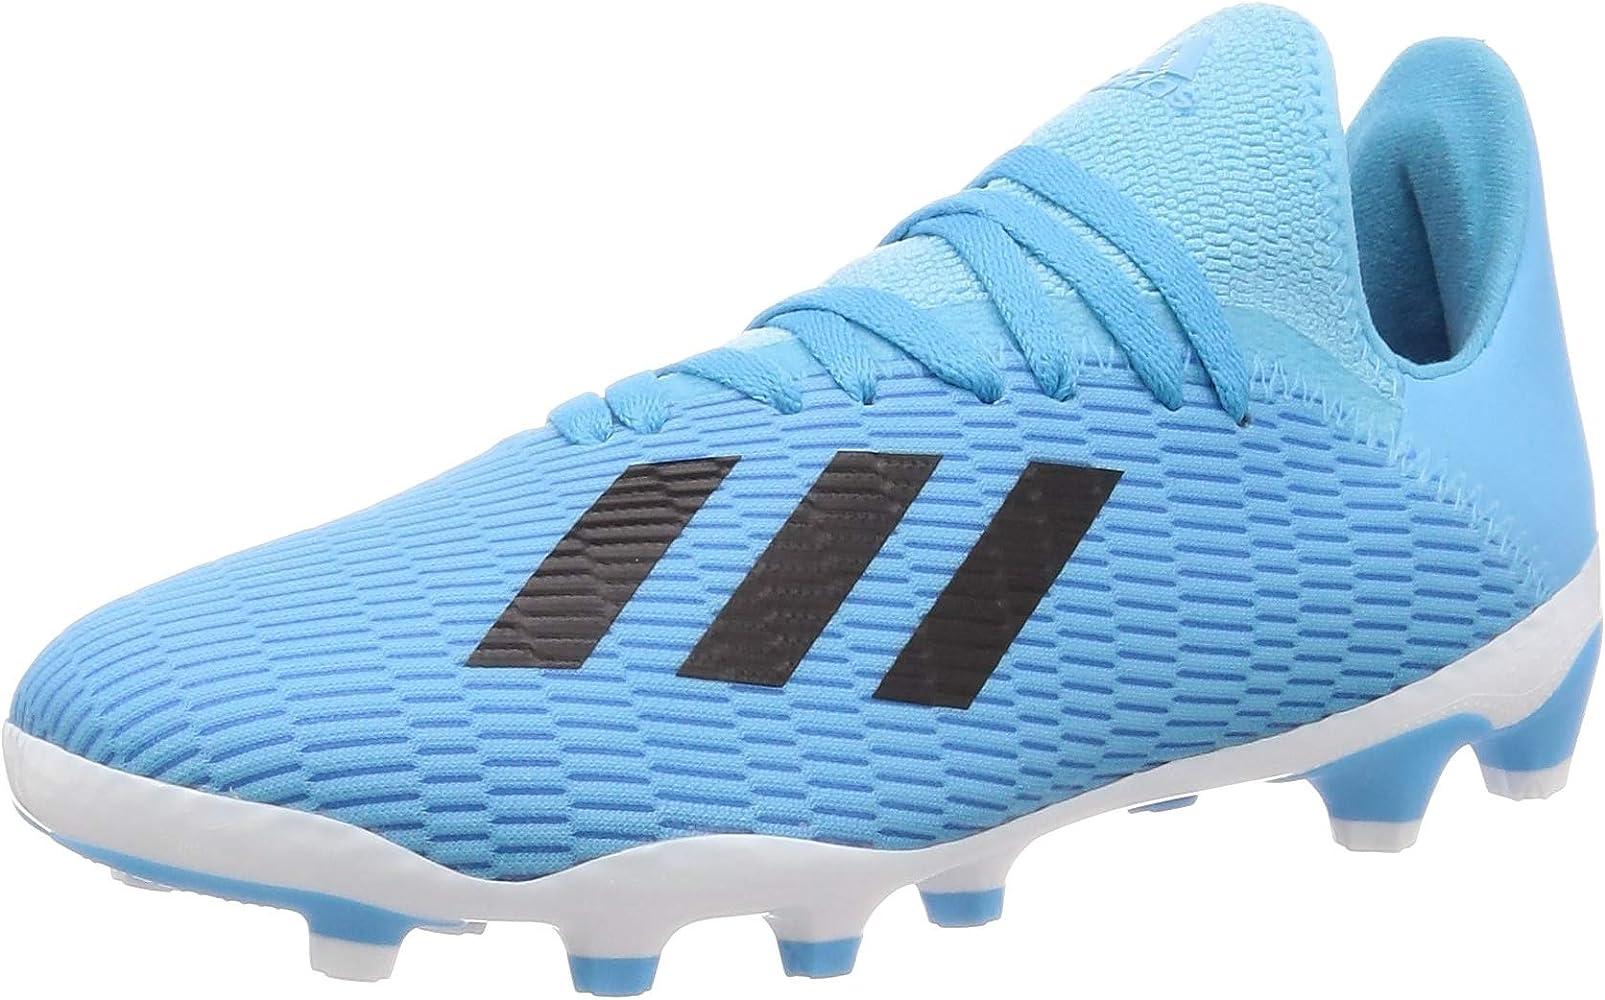 adidas Boys Soccer Shoes Cleats Children Football X 19.3 MG Junior EF7550 New